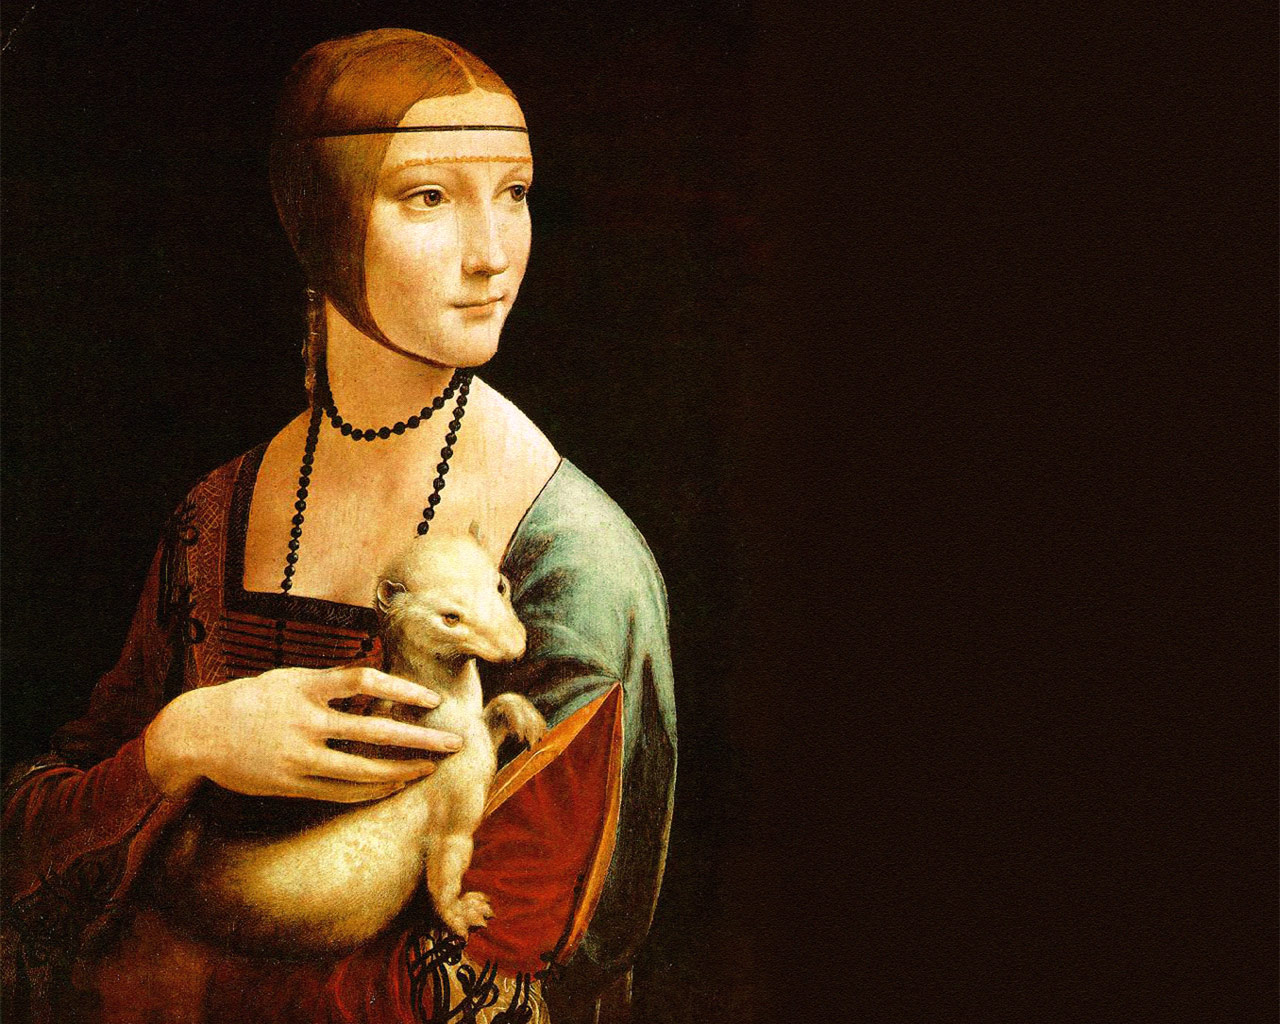 Art Wallpapers Hd Leonardo Da Vinci Wallpapers